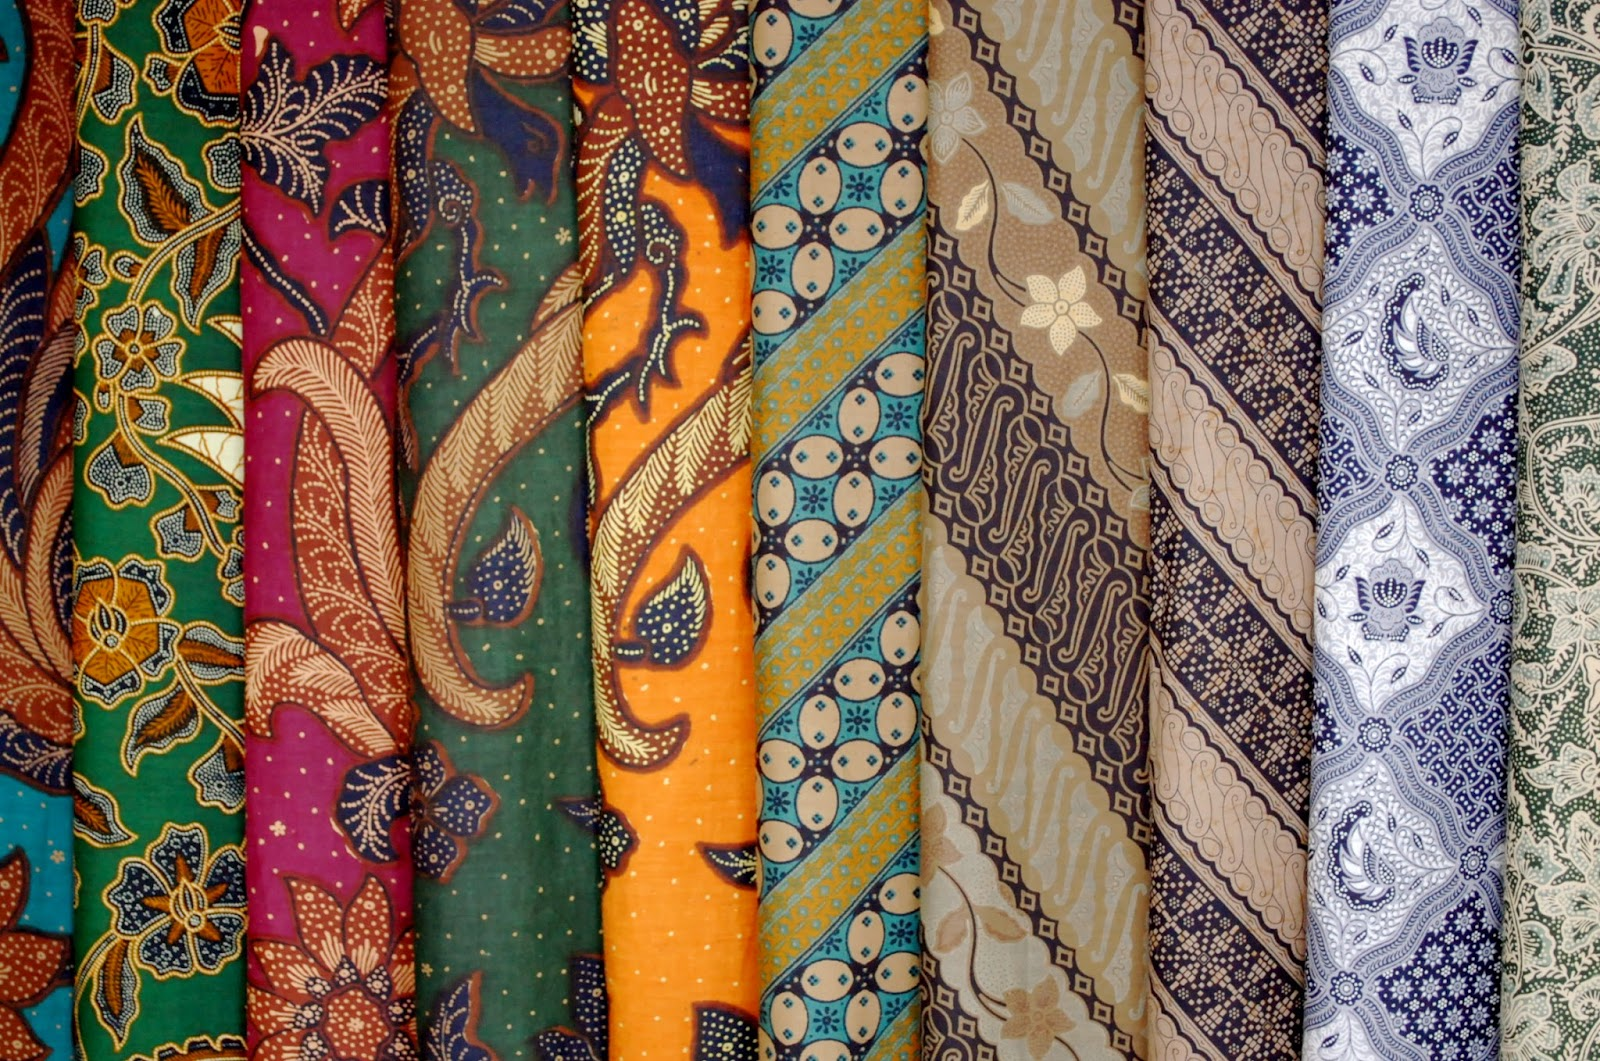 Keagungan Seni Batik, Tips Batik, Info Batik, Pola Batik, Desain Batik, Belanja Batik, Batik Semarang, Batik Jayakarta,